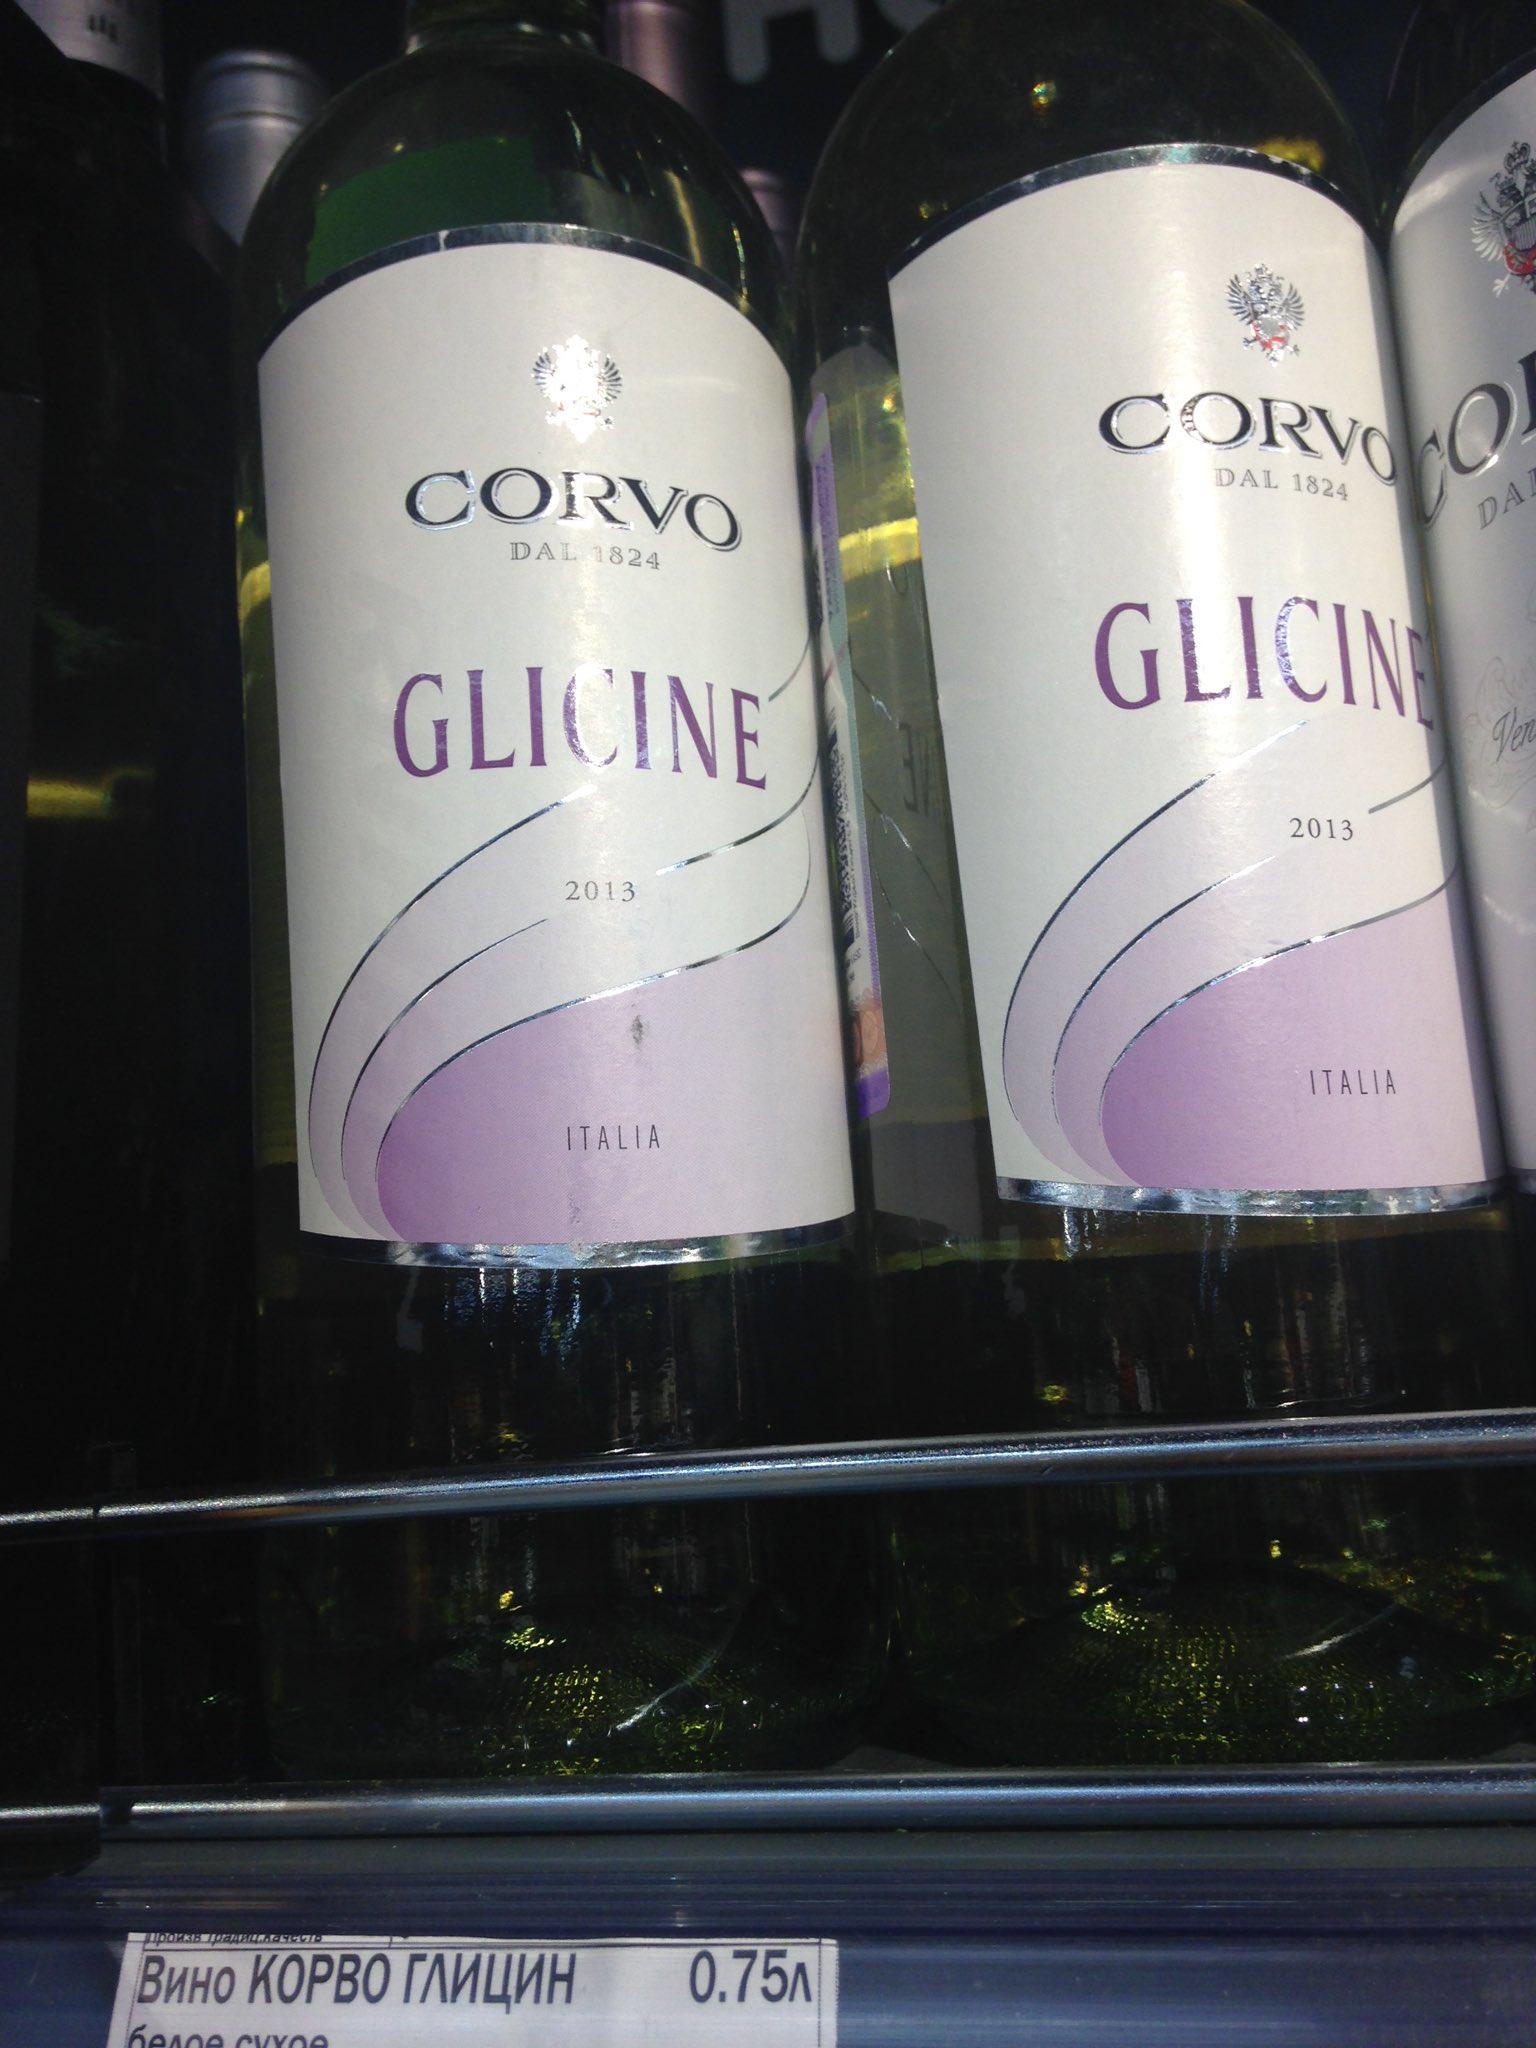 Прикольная картинка про вино глицин